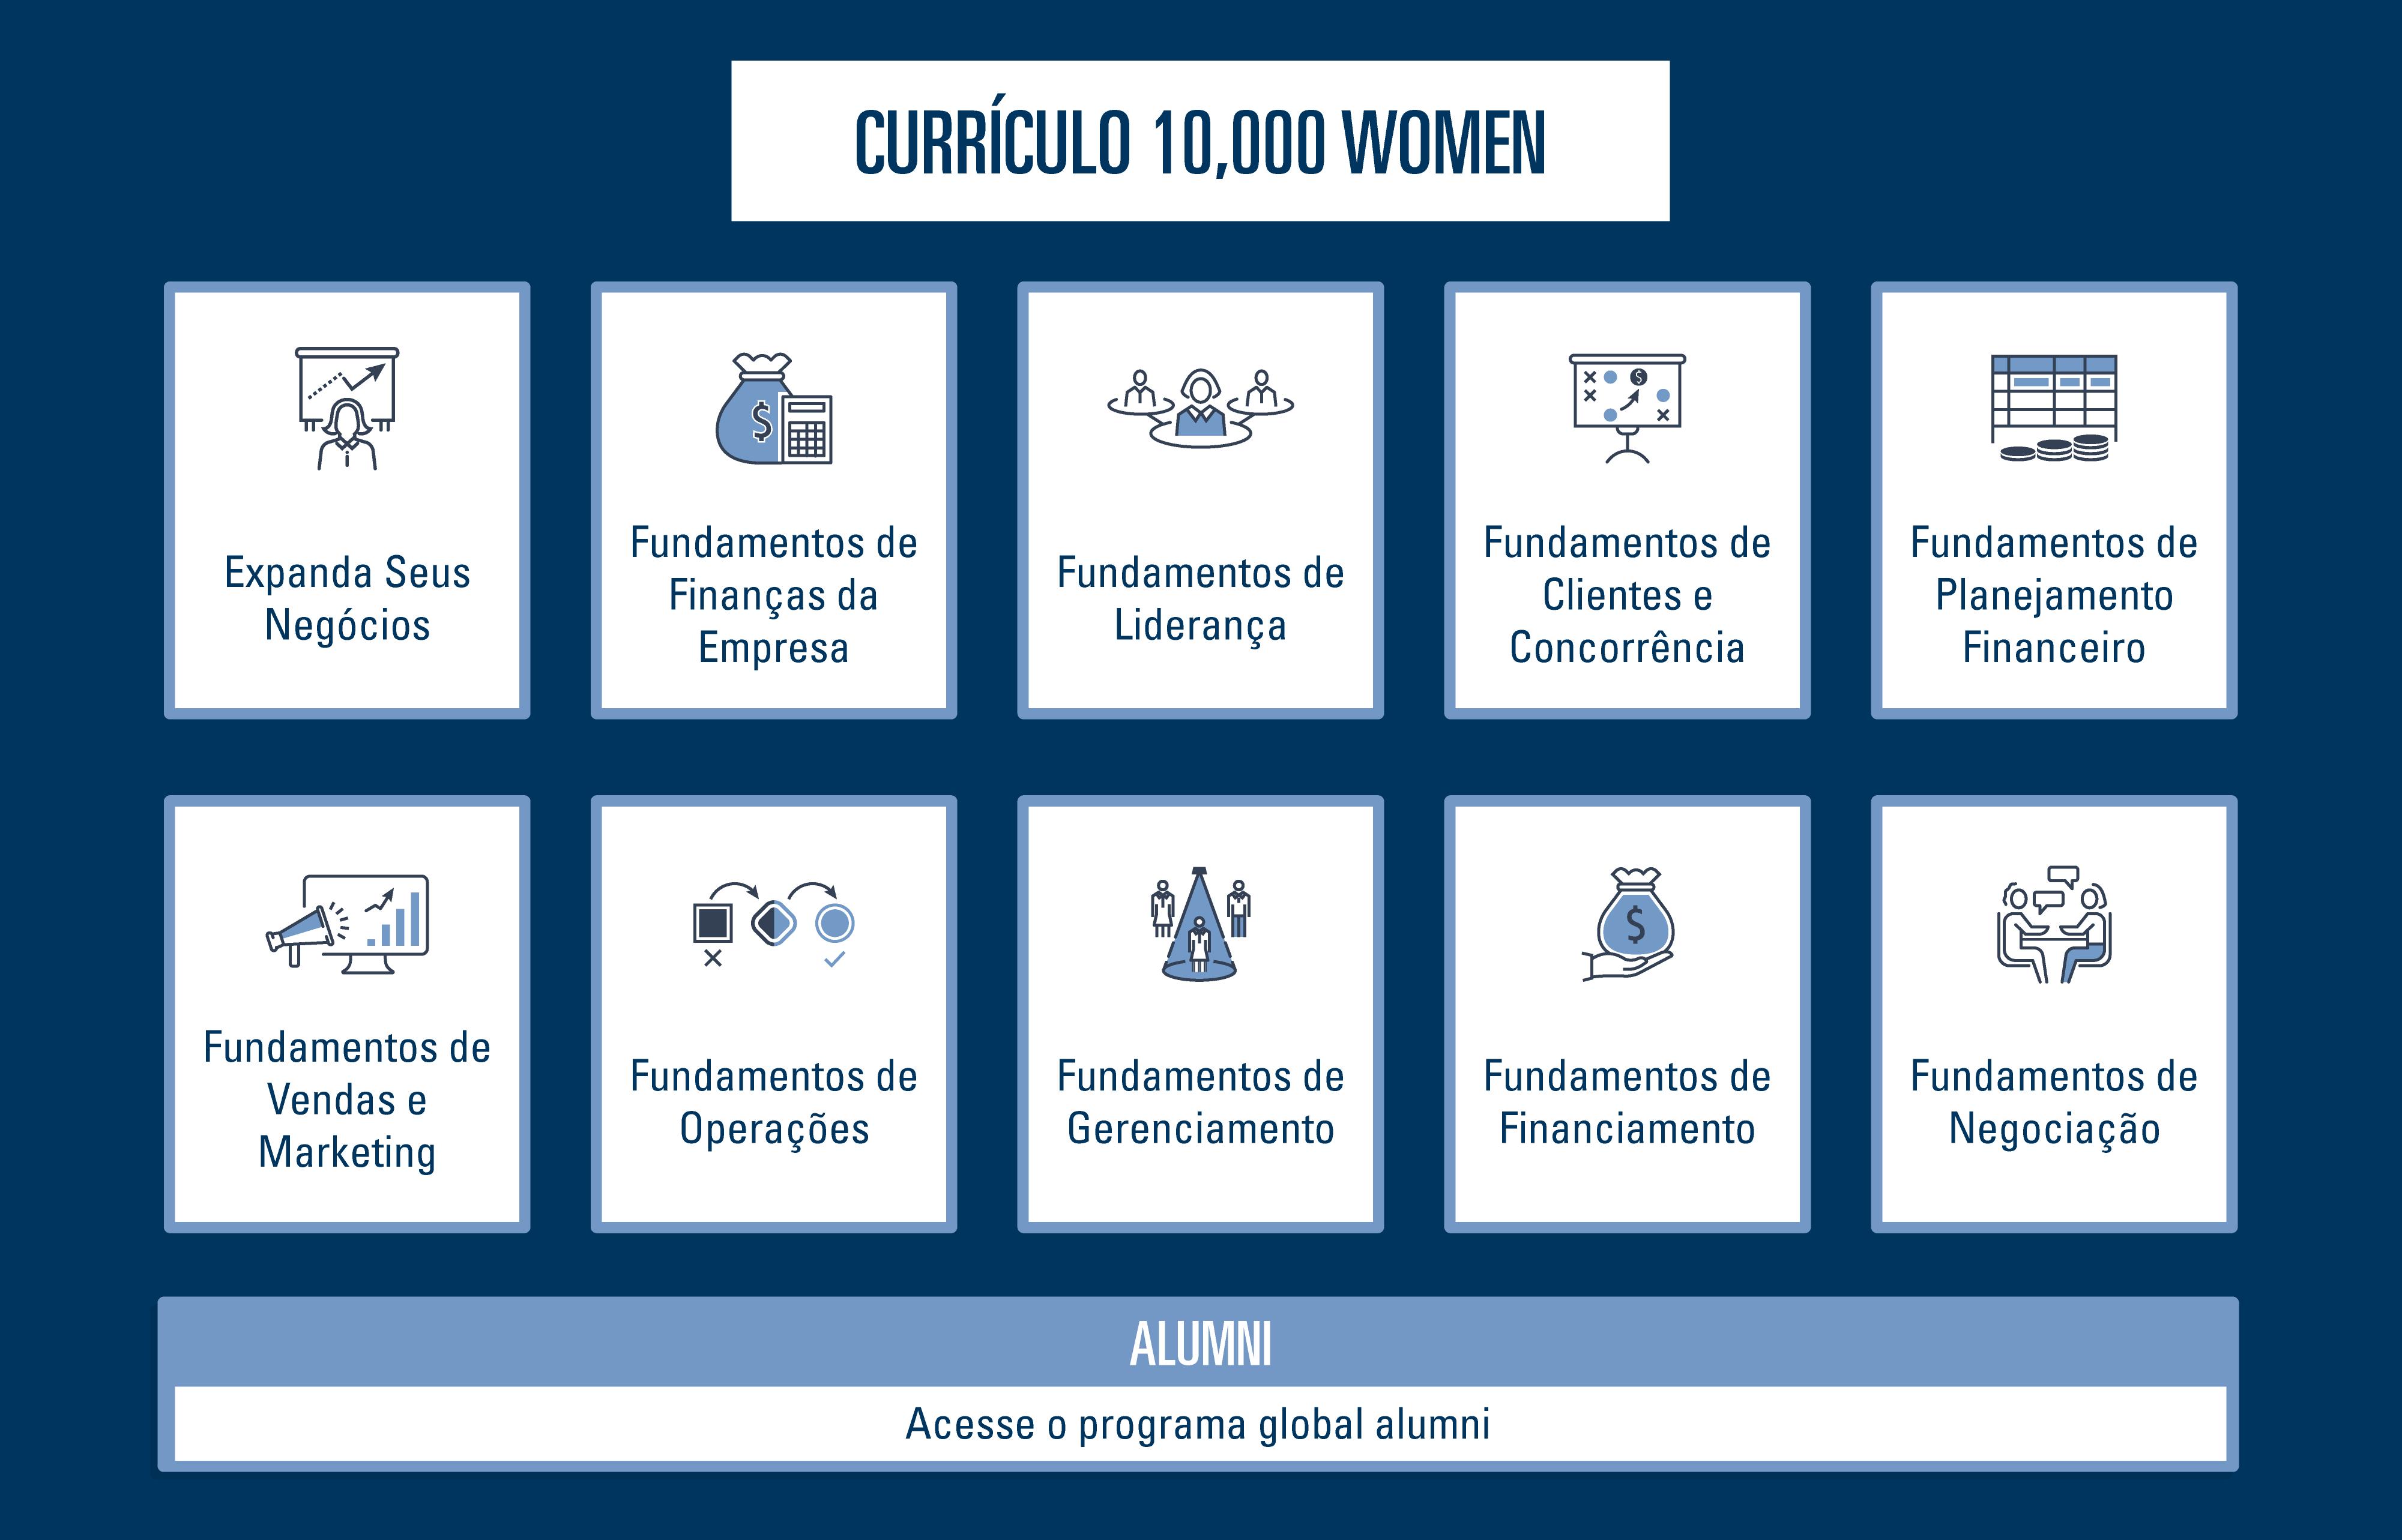 10,000 Women Curriculum